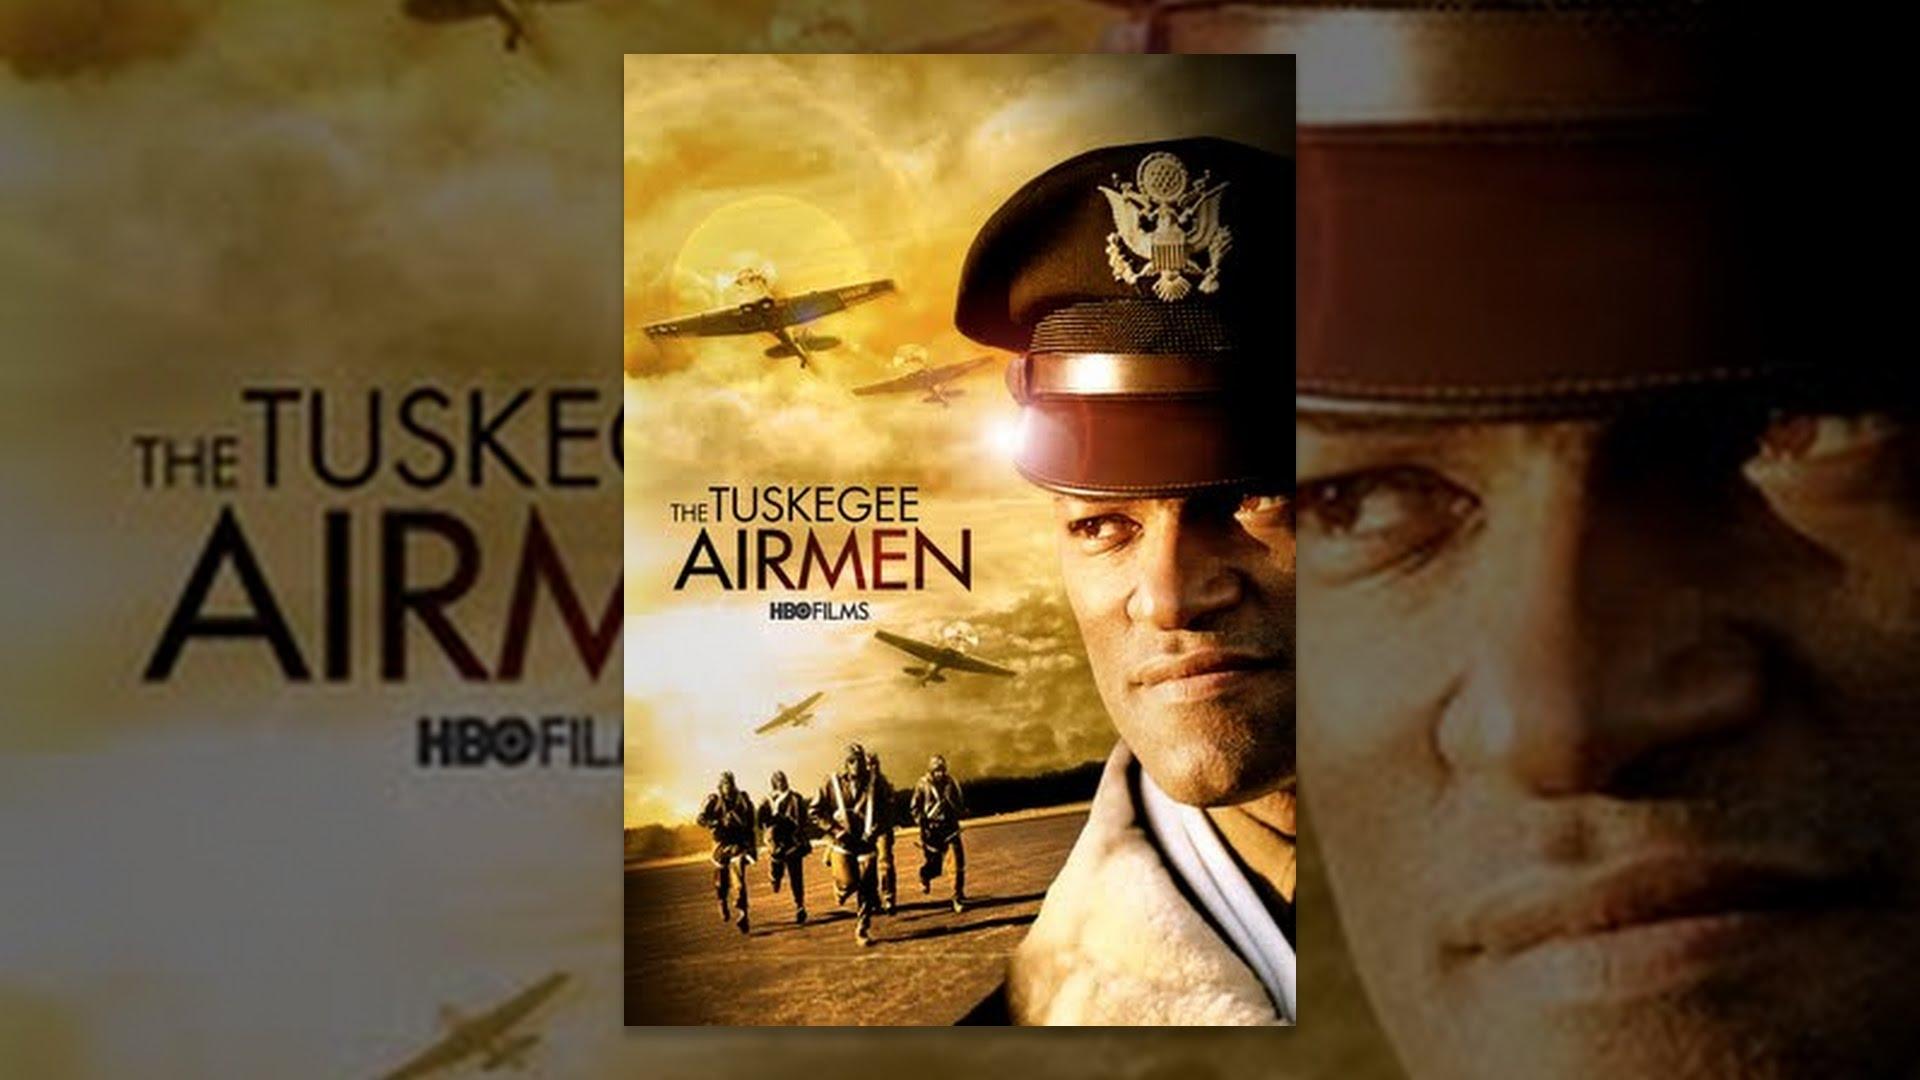 The Tuskegee Airmen Youtube